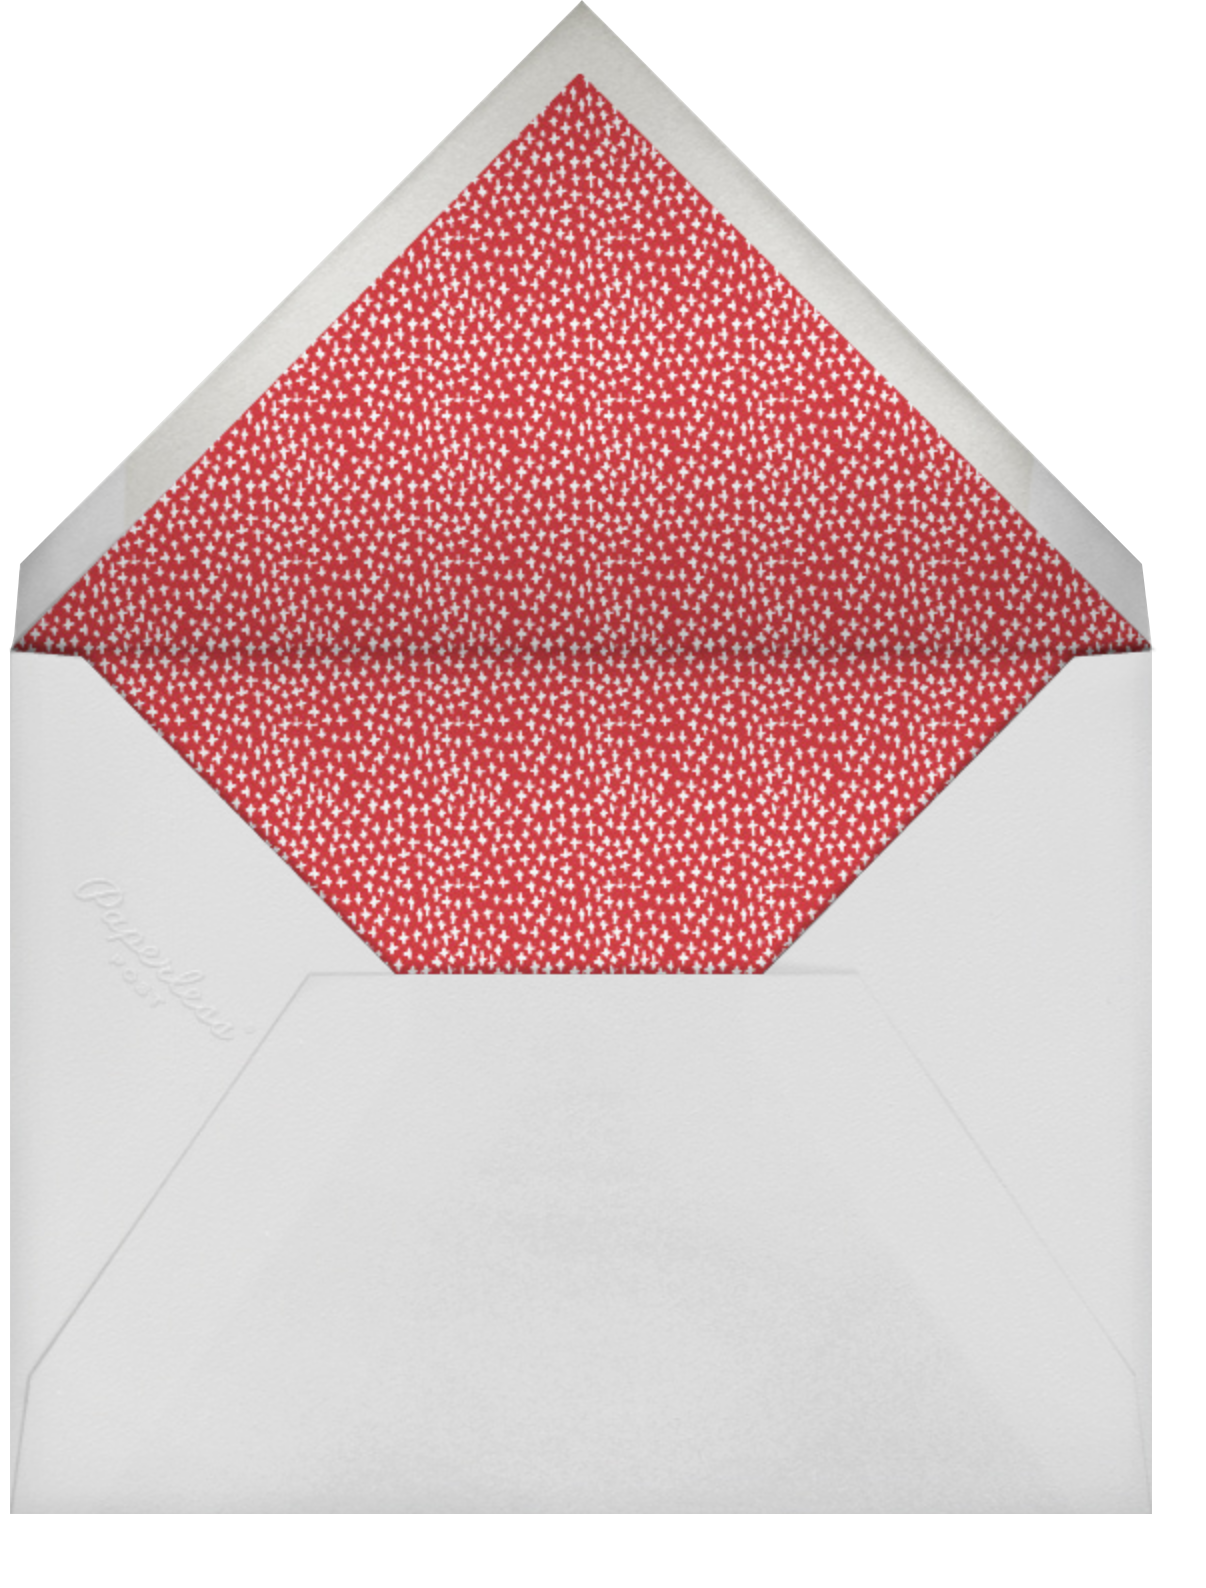 All Good Things - Mr. Boddington's Studio - Envelope